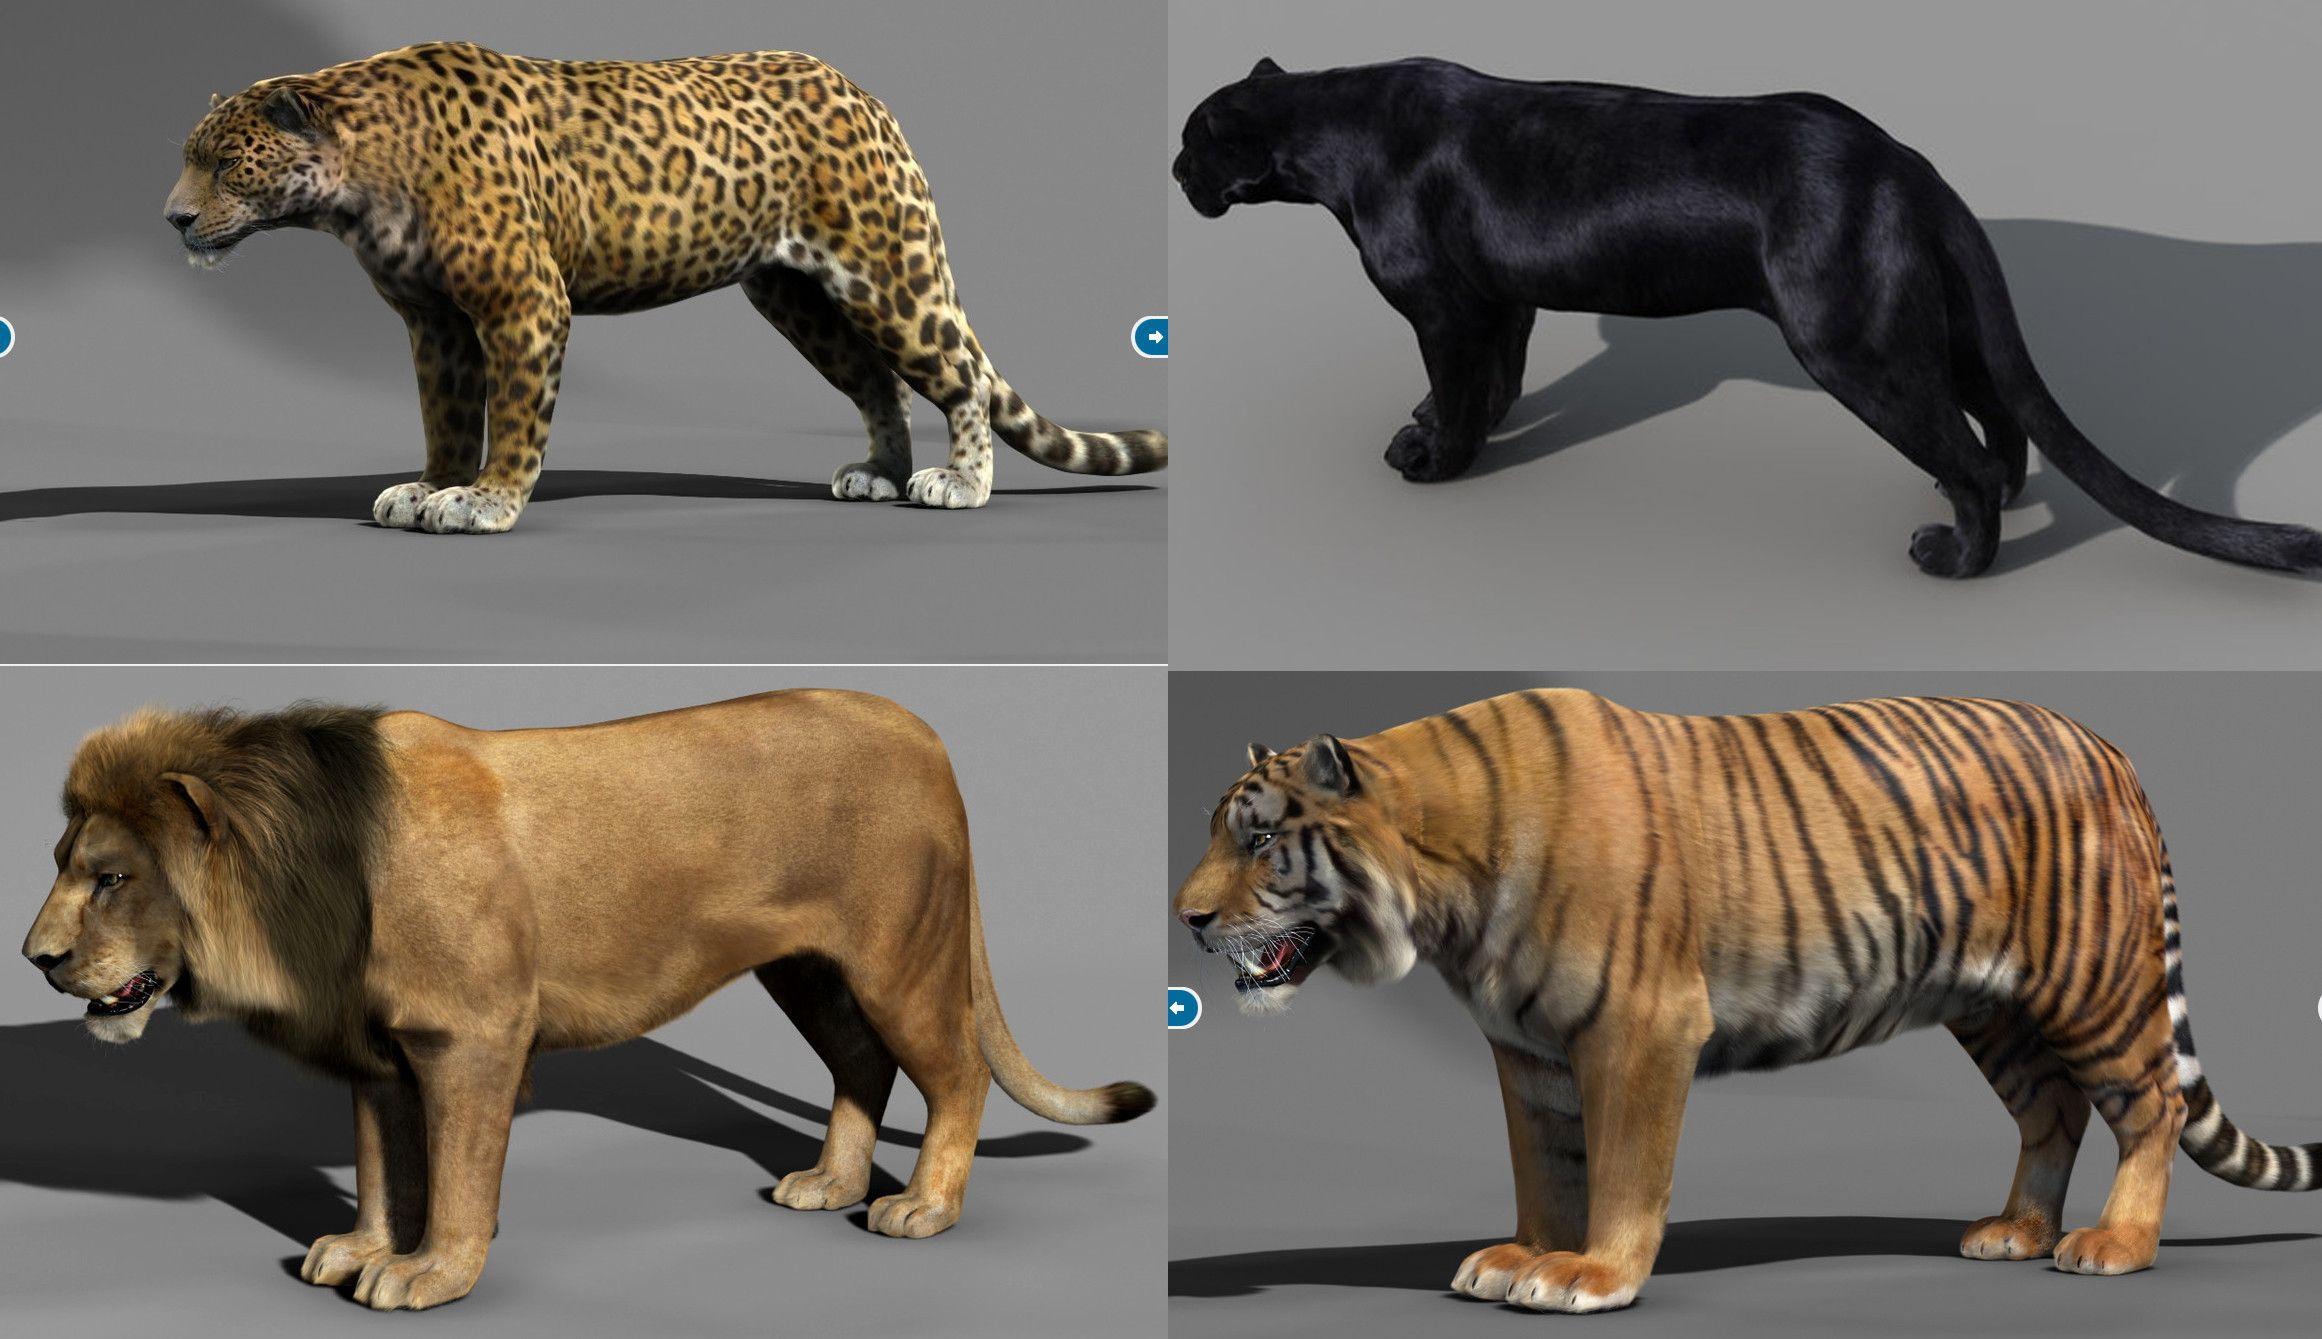 panther jaguar hybrid Buscar con Google